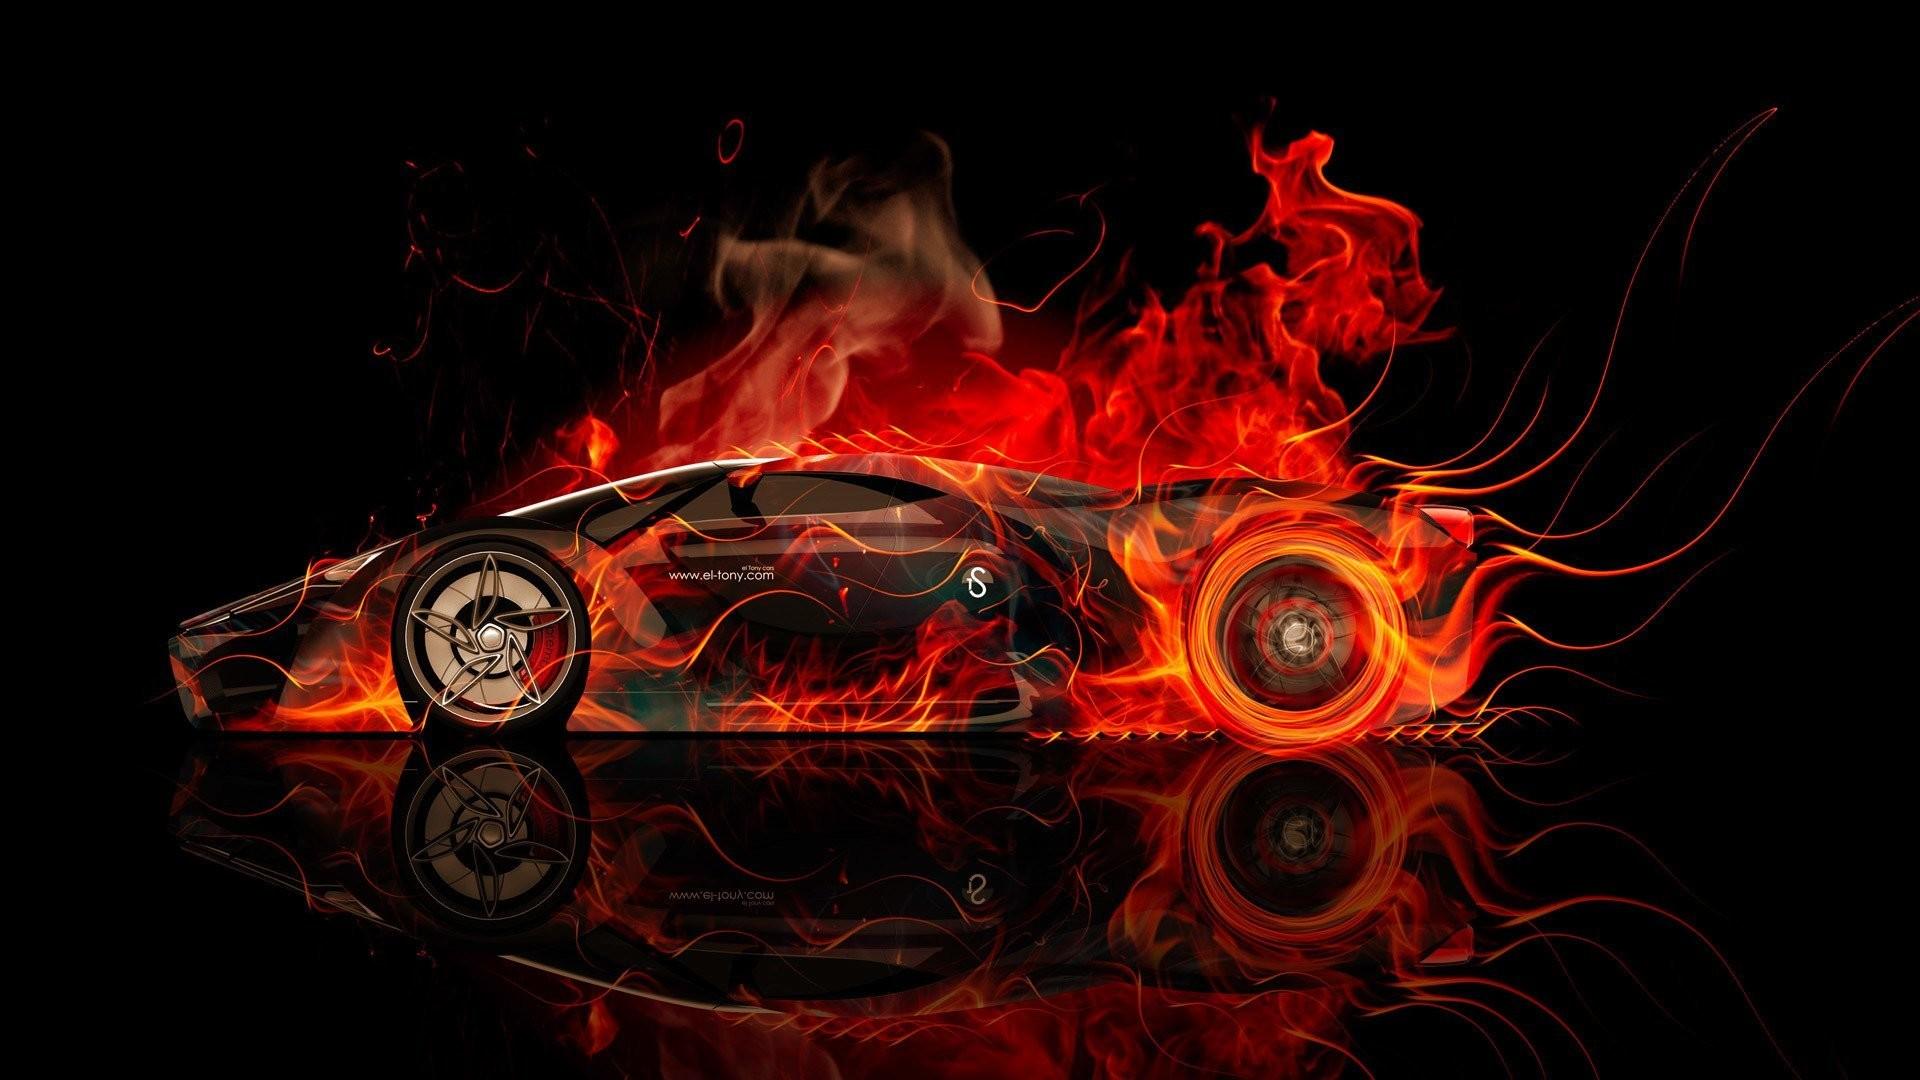 tony kokhan ferrari f80 side fire car concept abstract orange colors  aerography black hd wallpapers supercar